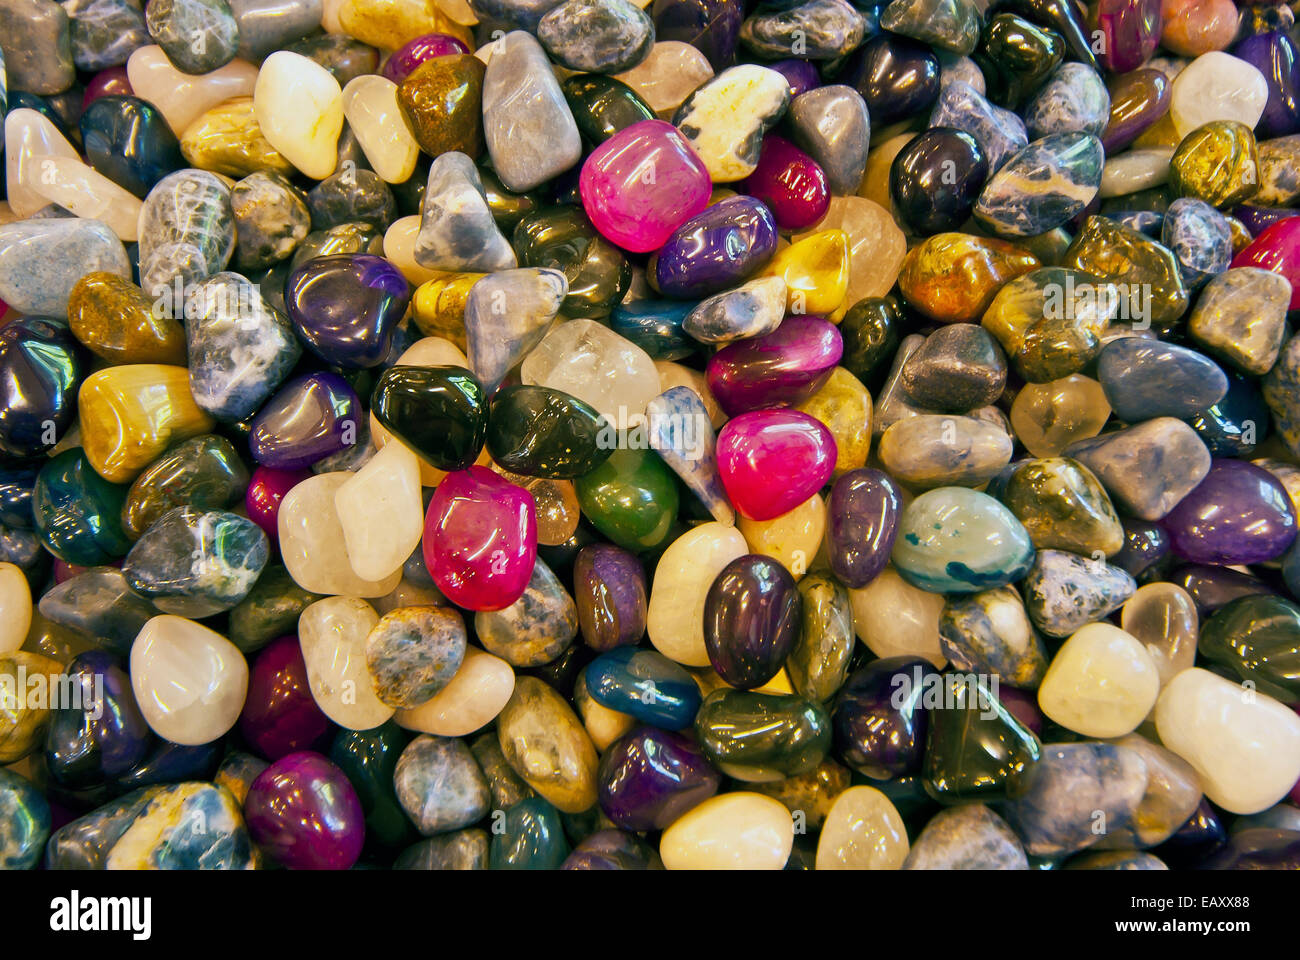 Colorful gem stones - Stock Image